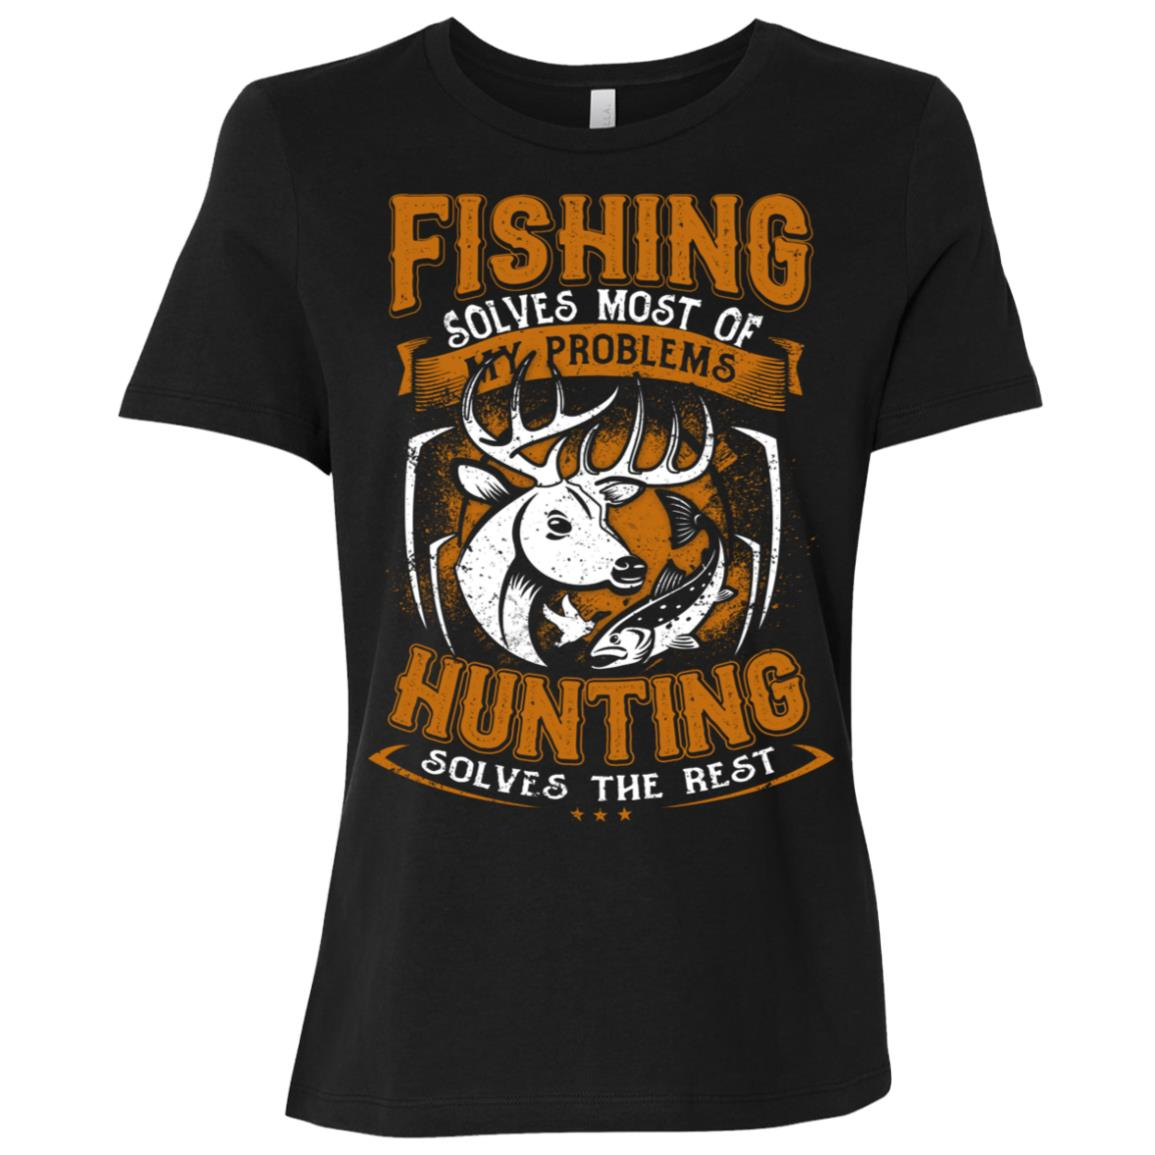 Funny Fishing Hunting Gift for Hunters Women Short Sleeve T-Shirt